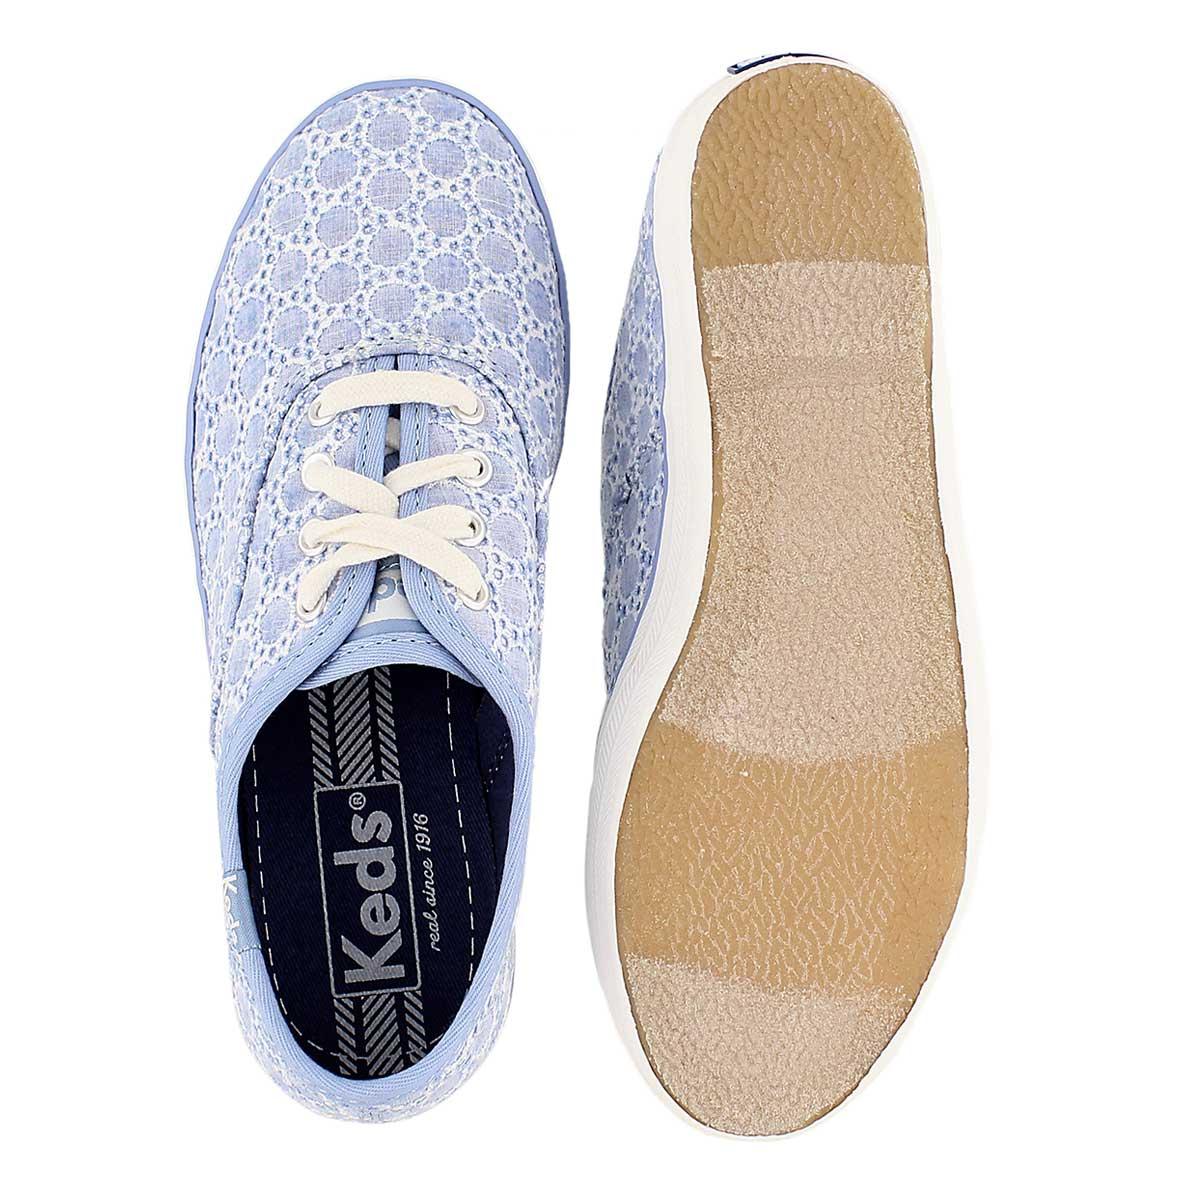 Grls Champion CVO Seasonal blue sneaker